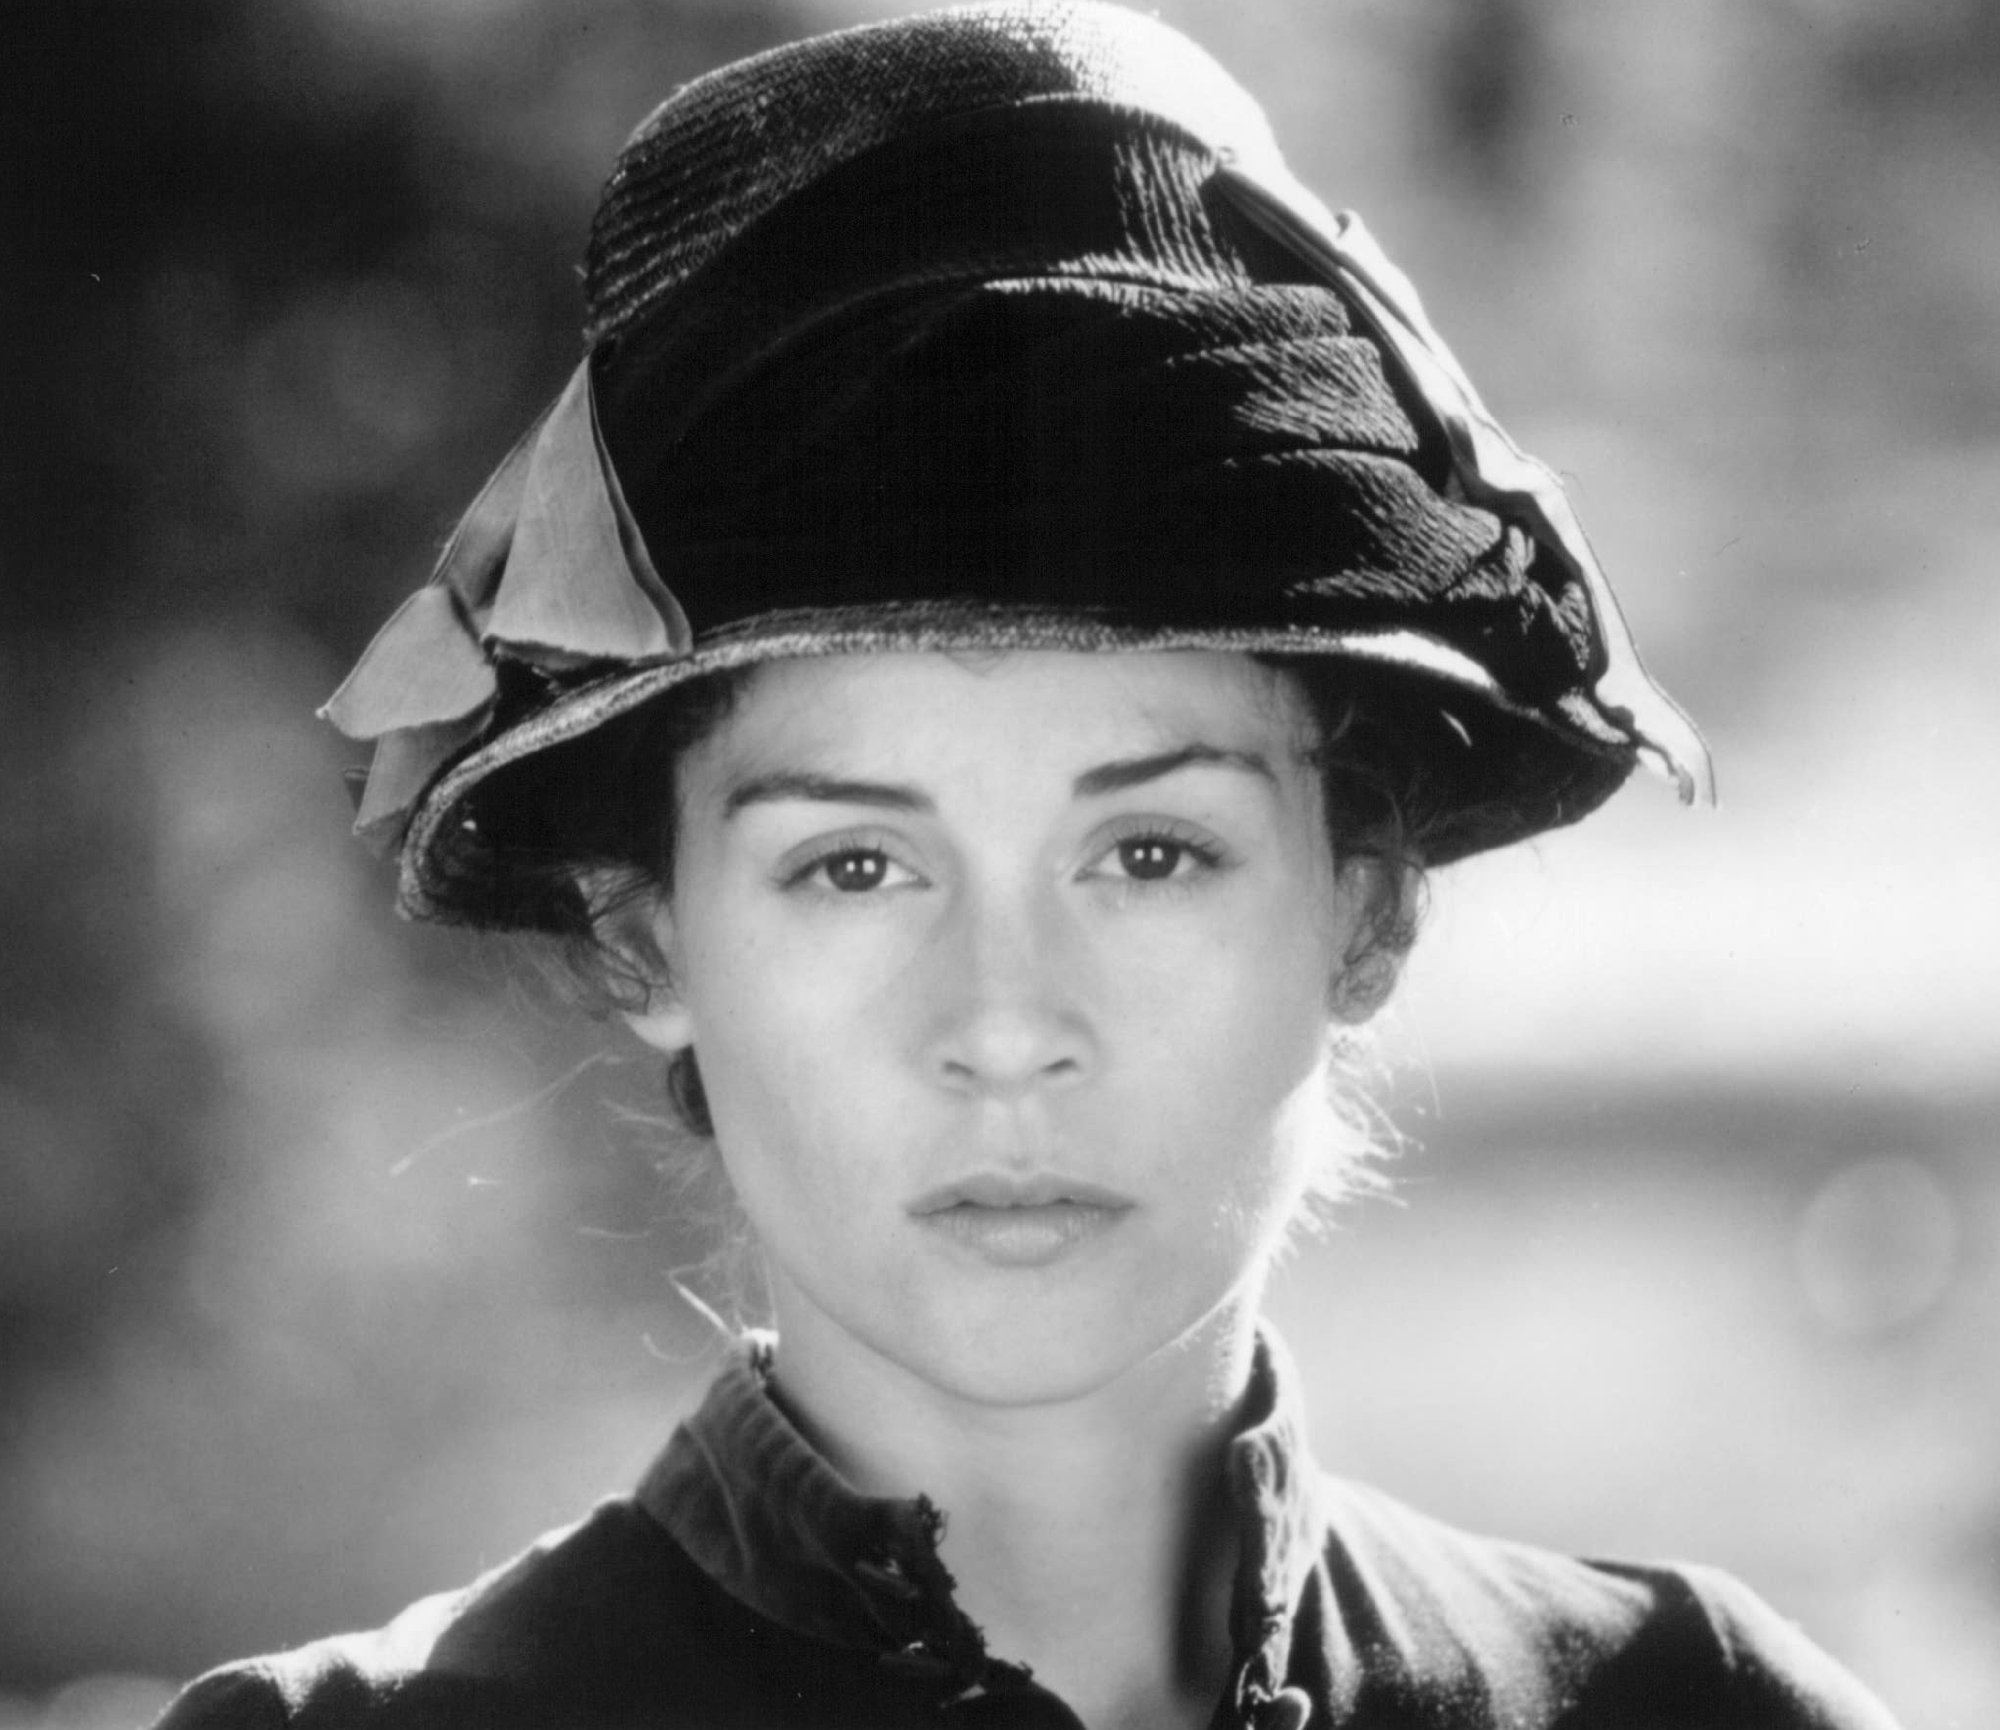 embeth davidtz filmographie - photo #36